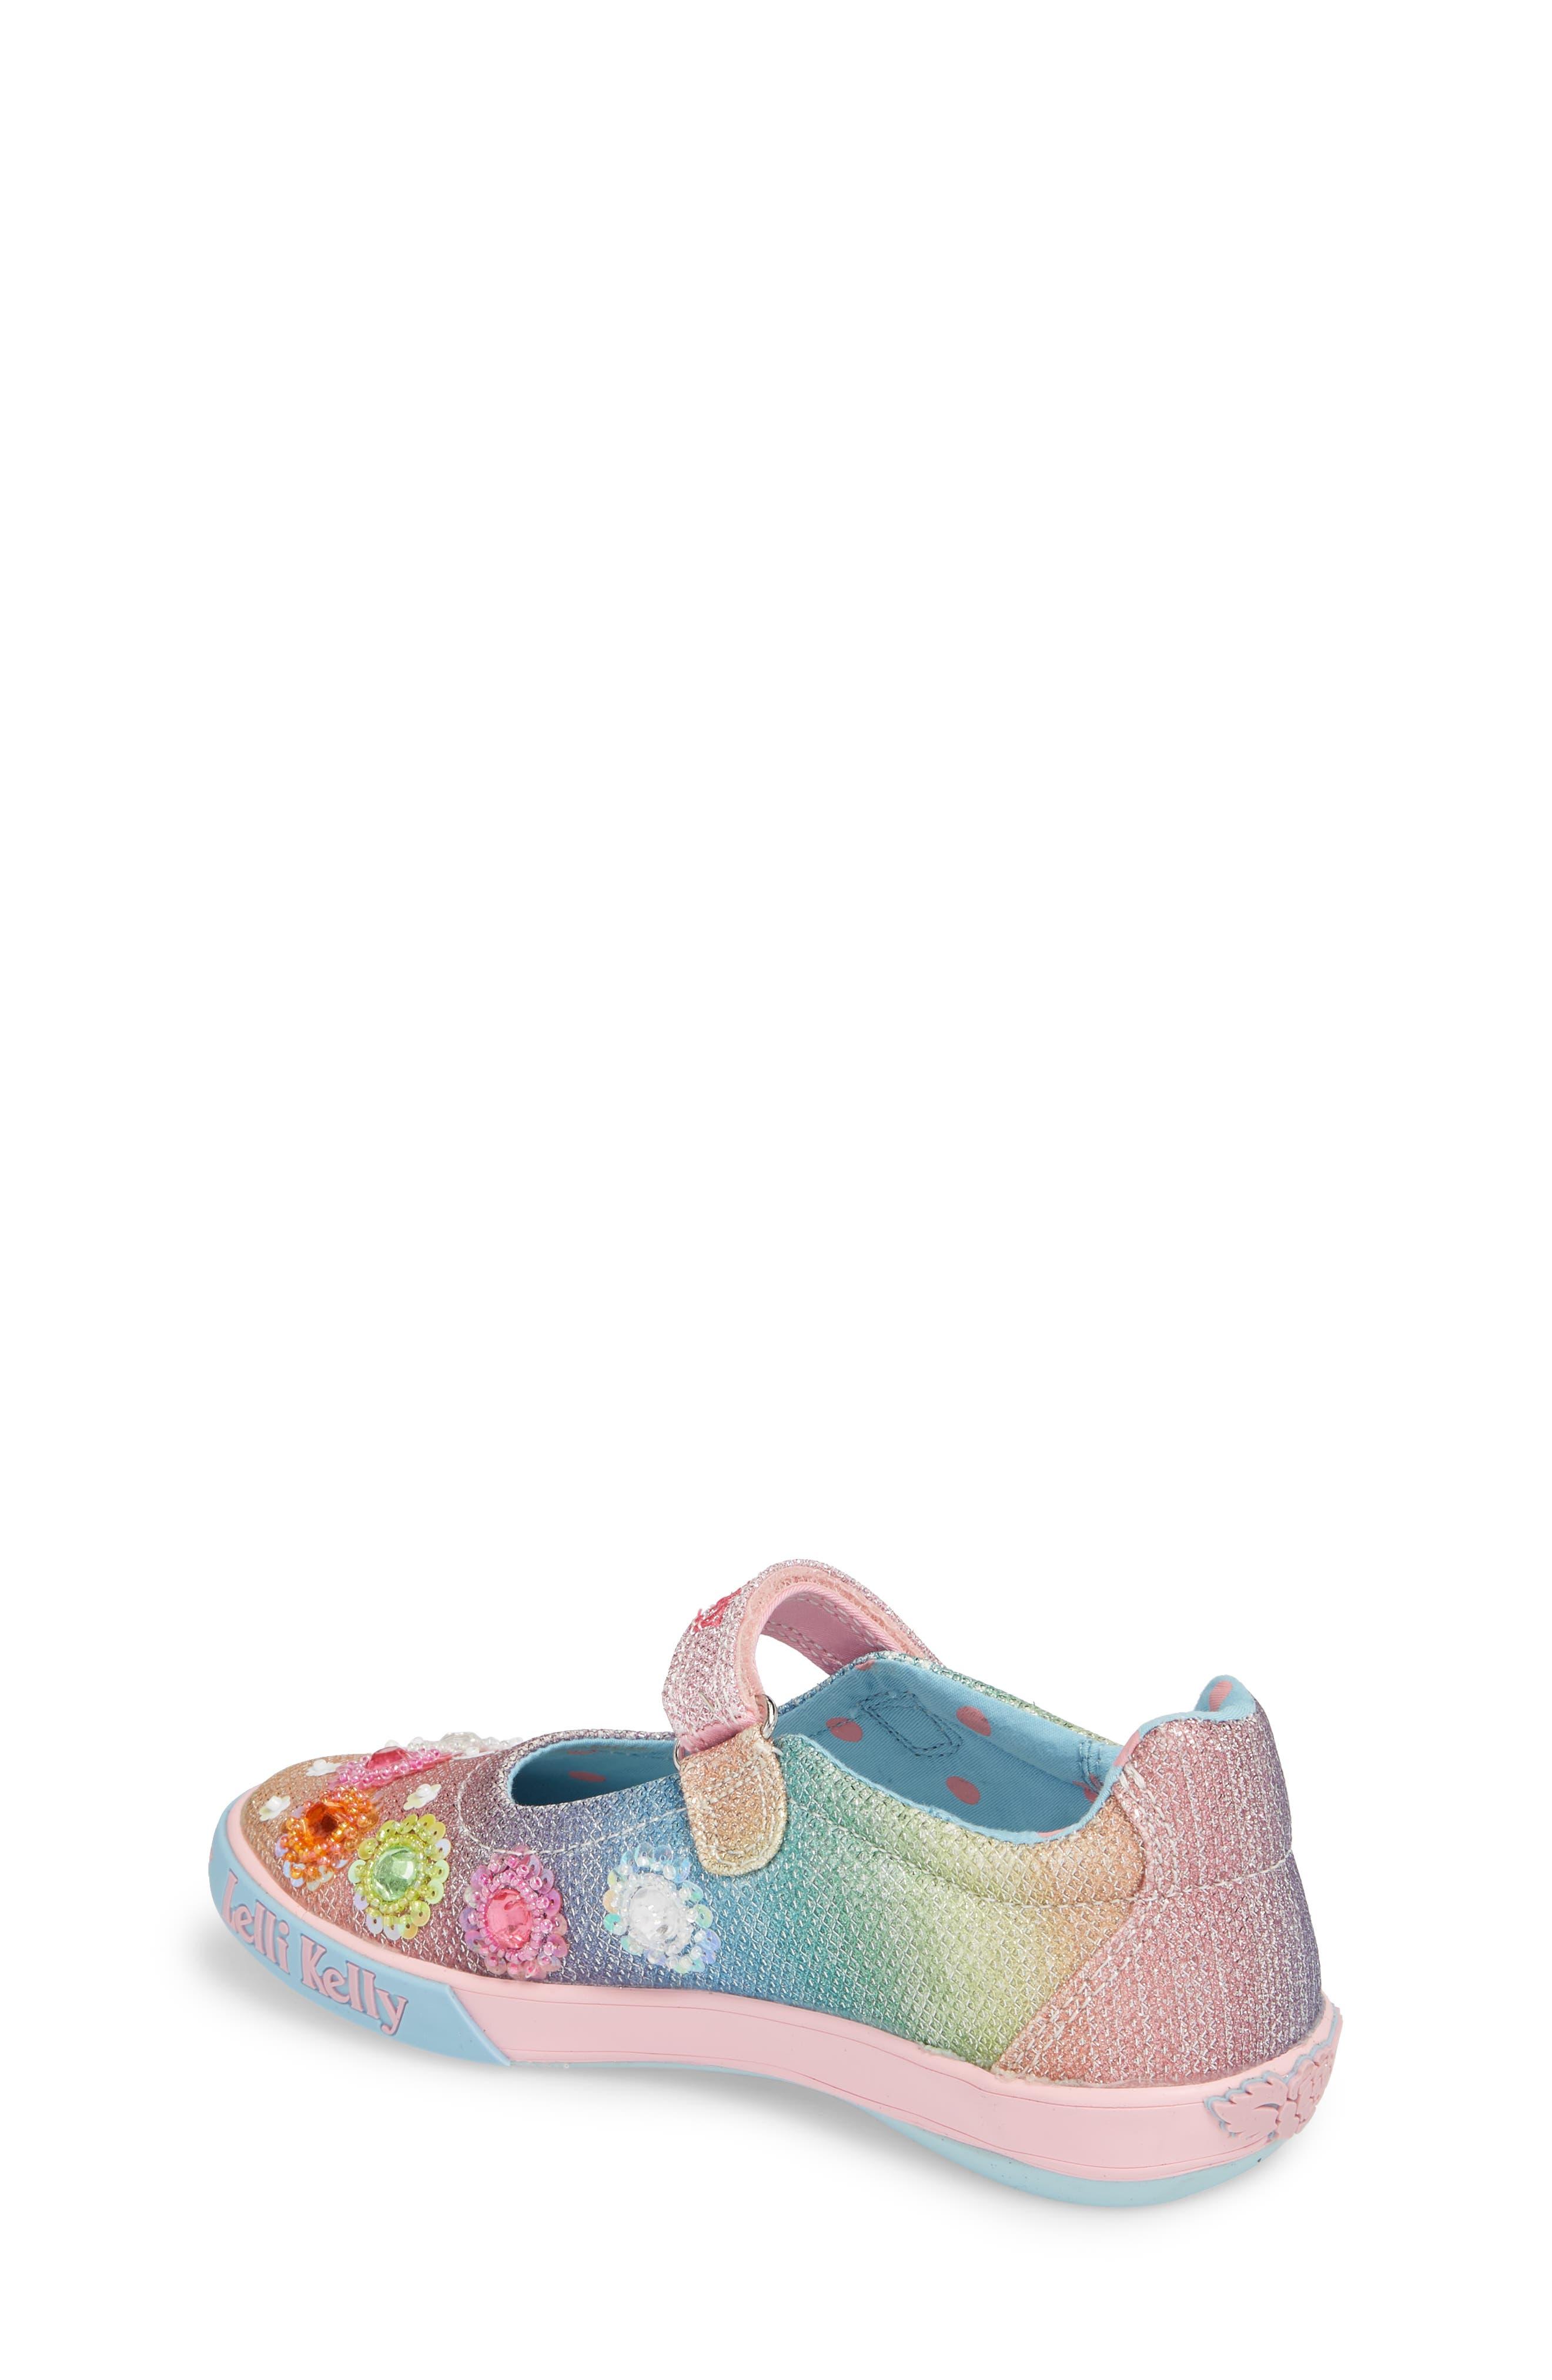 LELLI KELLY,                             Beaded Mary Jane Sneaker,                             Alternate thumbnail 2, color,                             BLUE